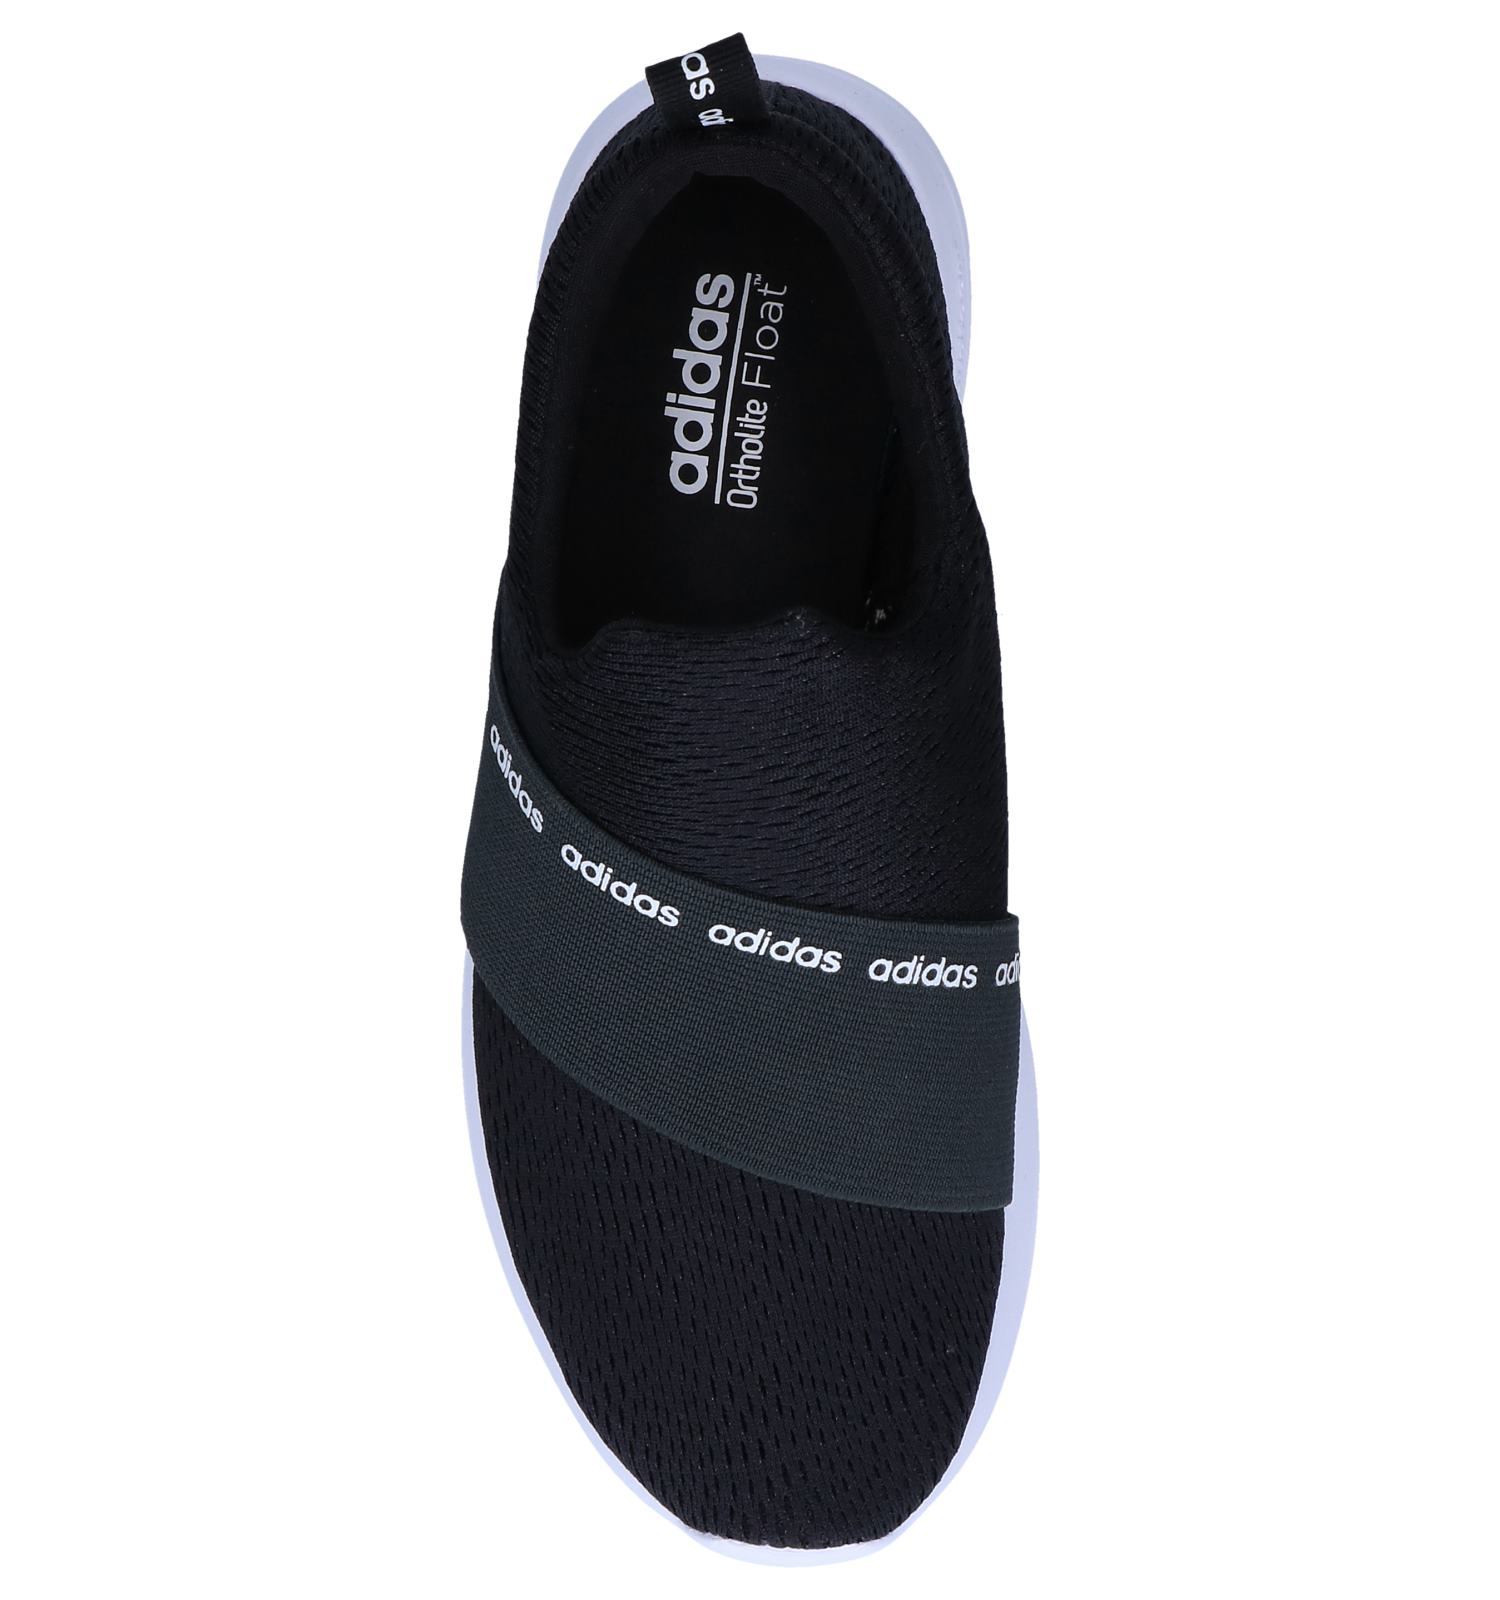 Zwarte Slip on Sneakers adidas CF Refine Adapt